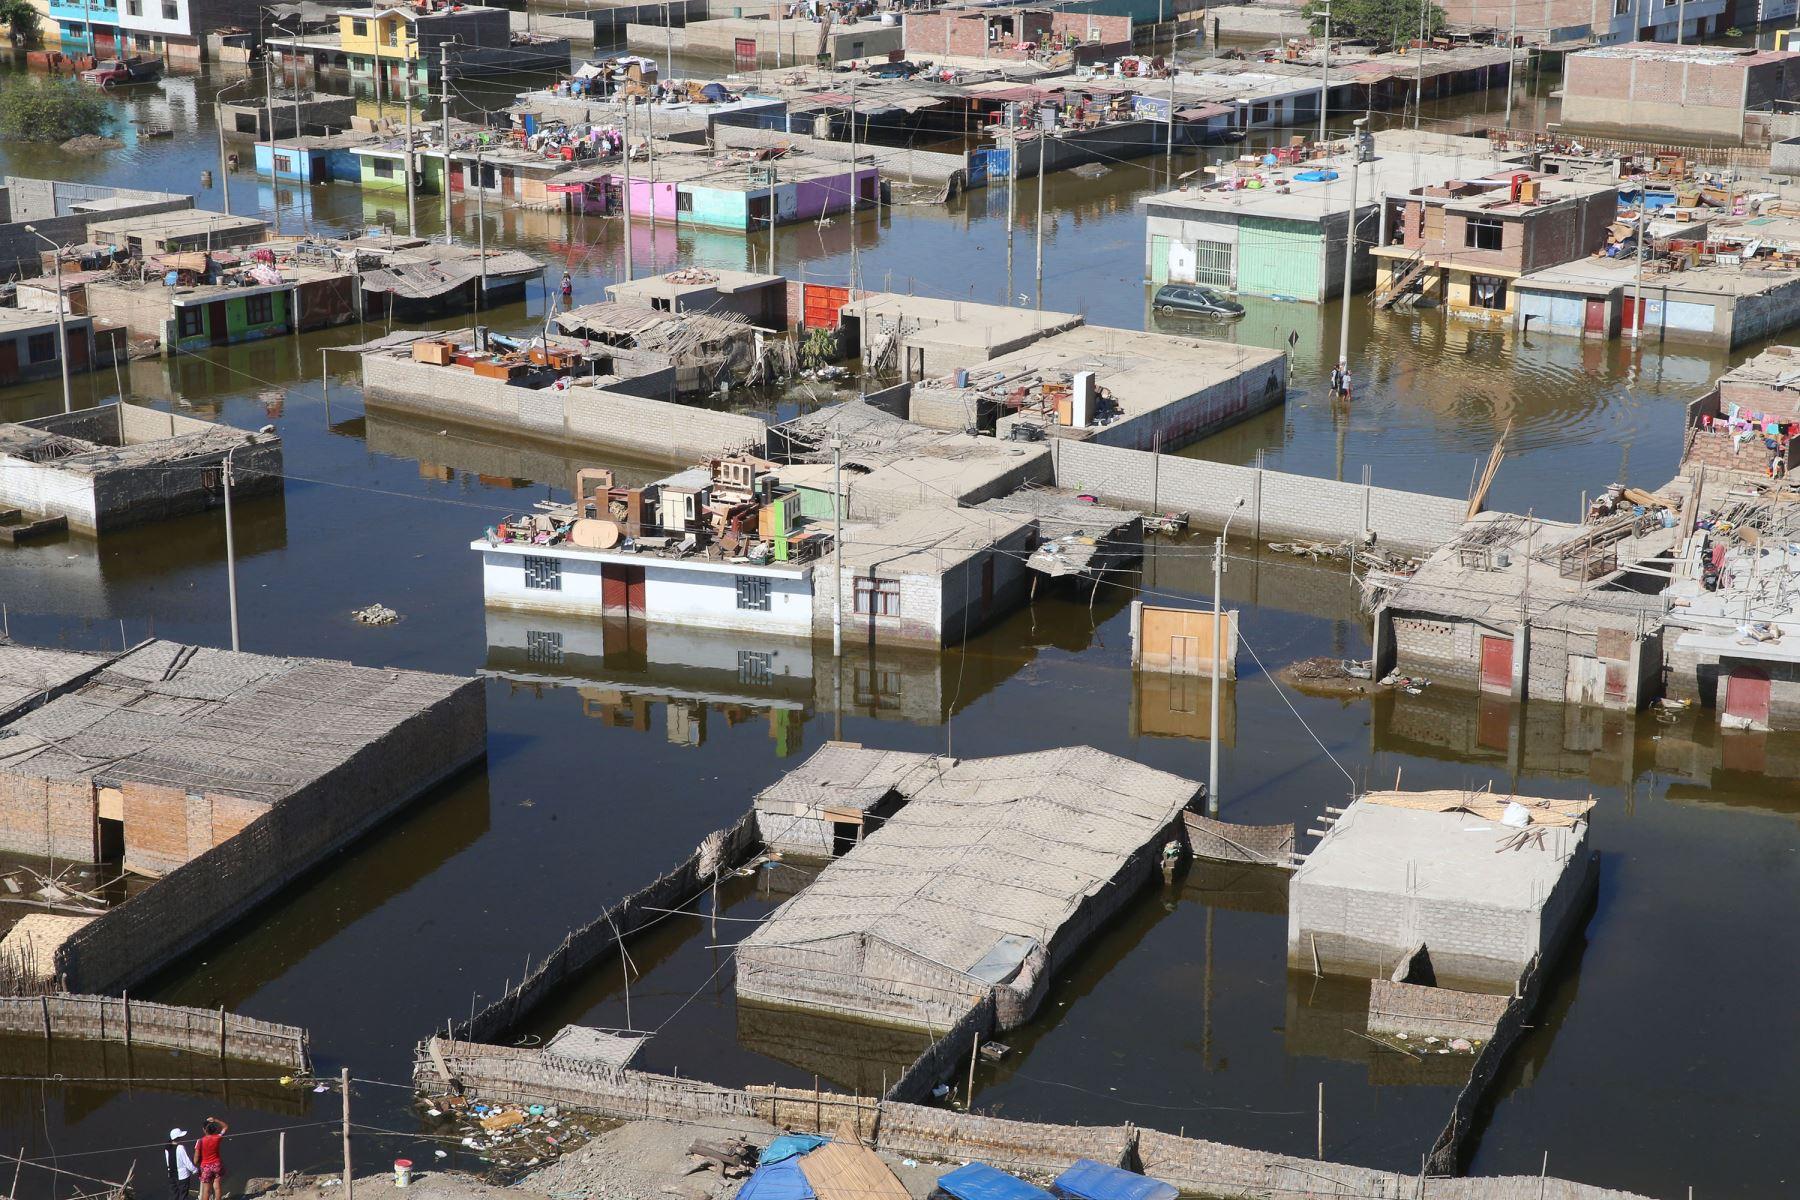 Viviendas resultaron afectadas por las lluvias e inundaciones. ANDINA/Vidal Tarqui